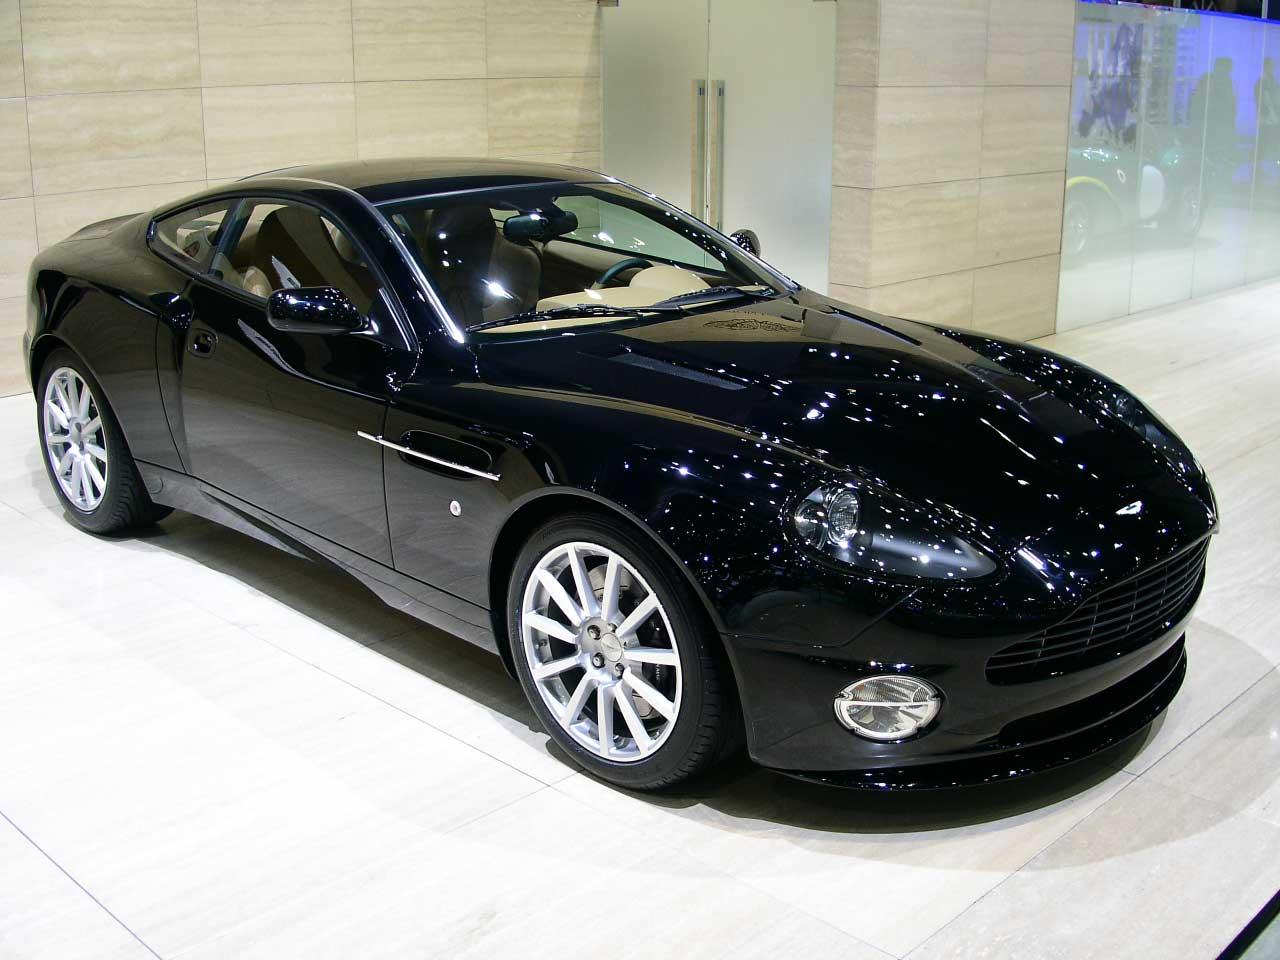 ... Aston Martin V12 Vanquish S